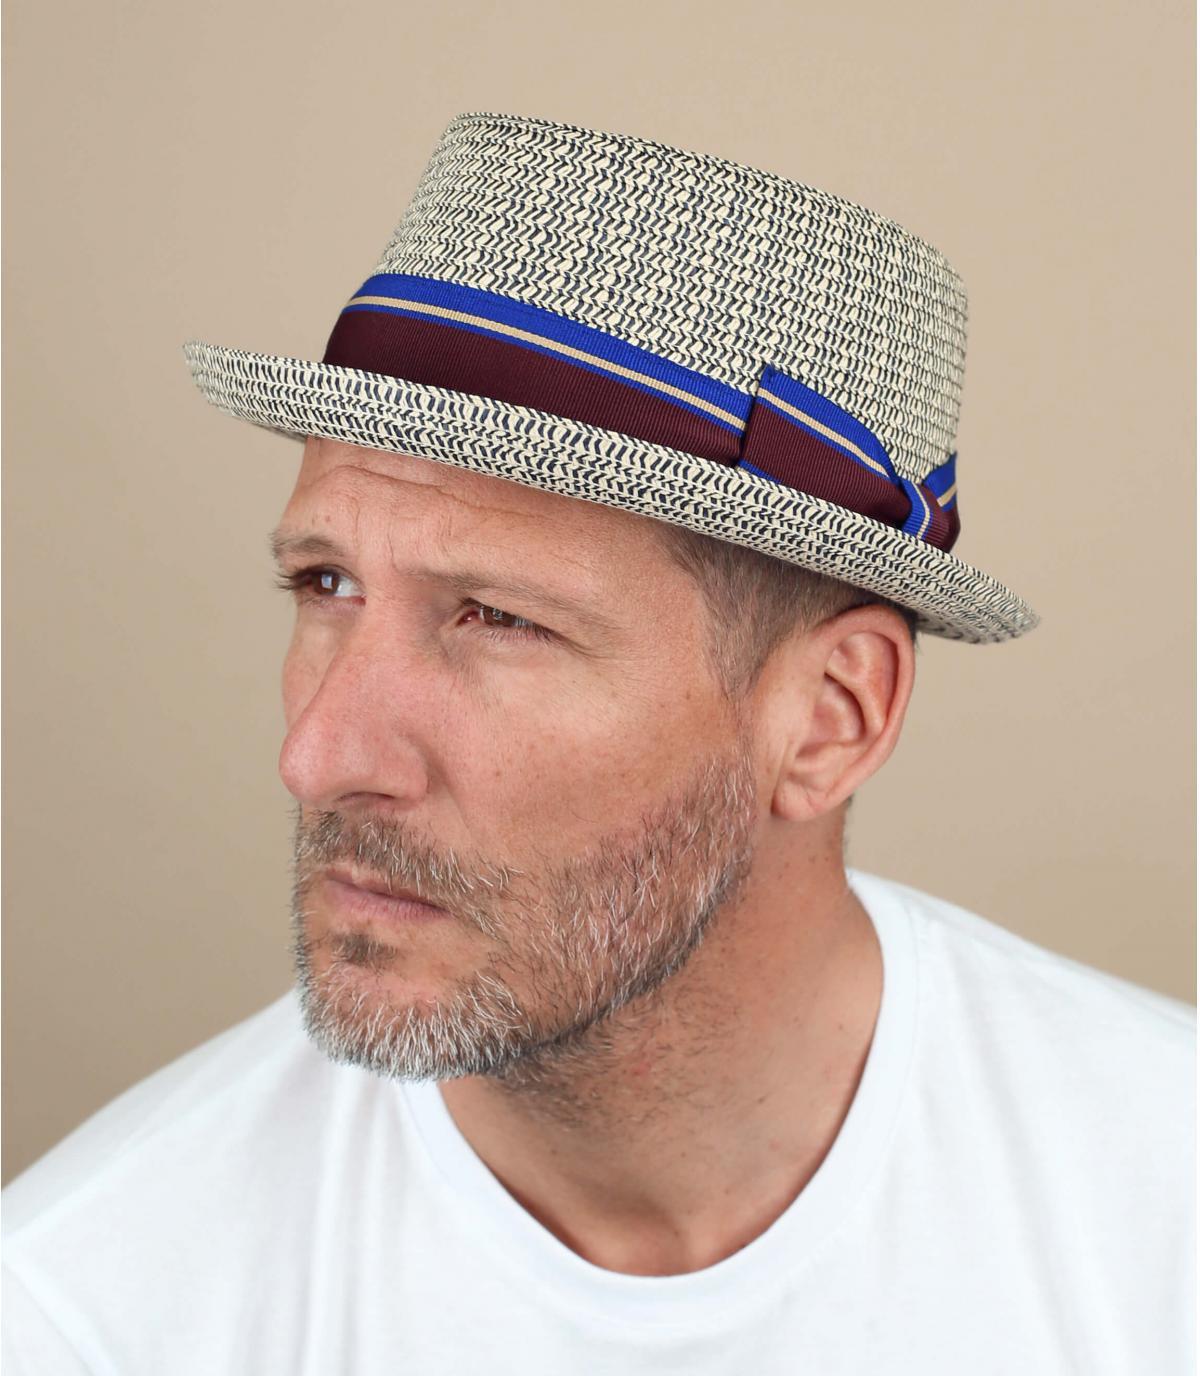 Sombrero paja azul